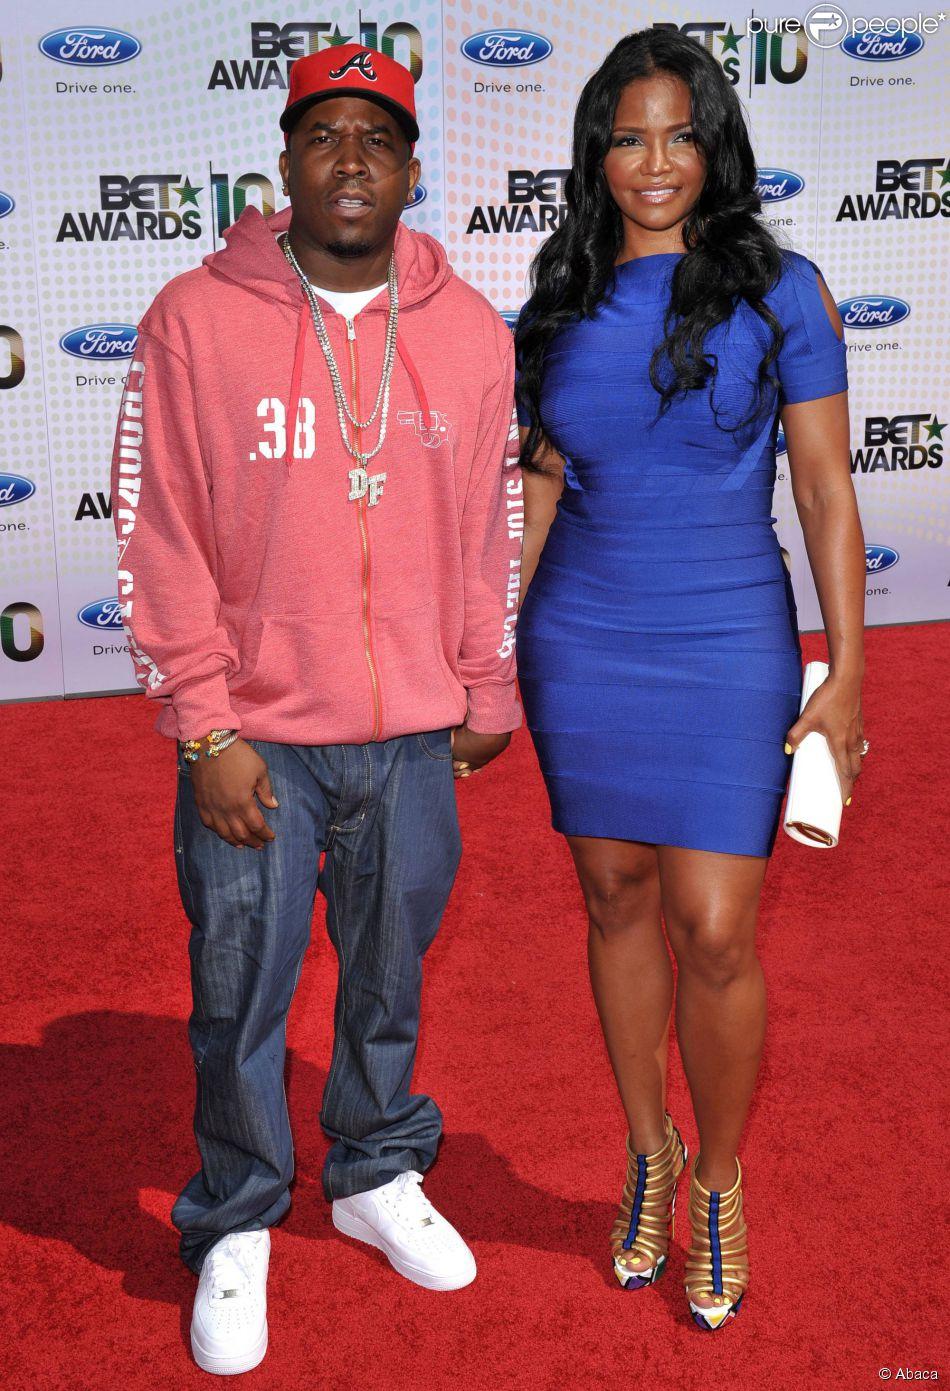 Big Boi et sa femme Sherlita à Los Angeles. Juin 2010.